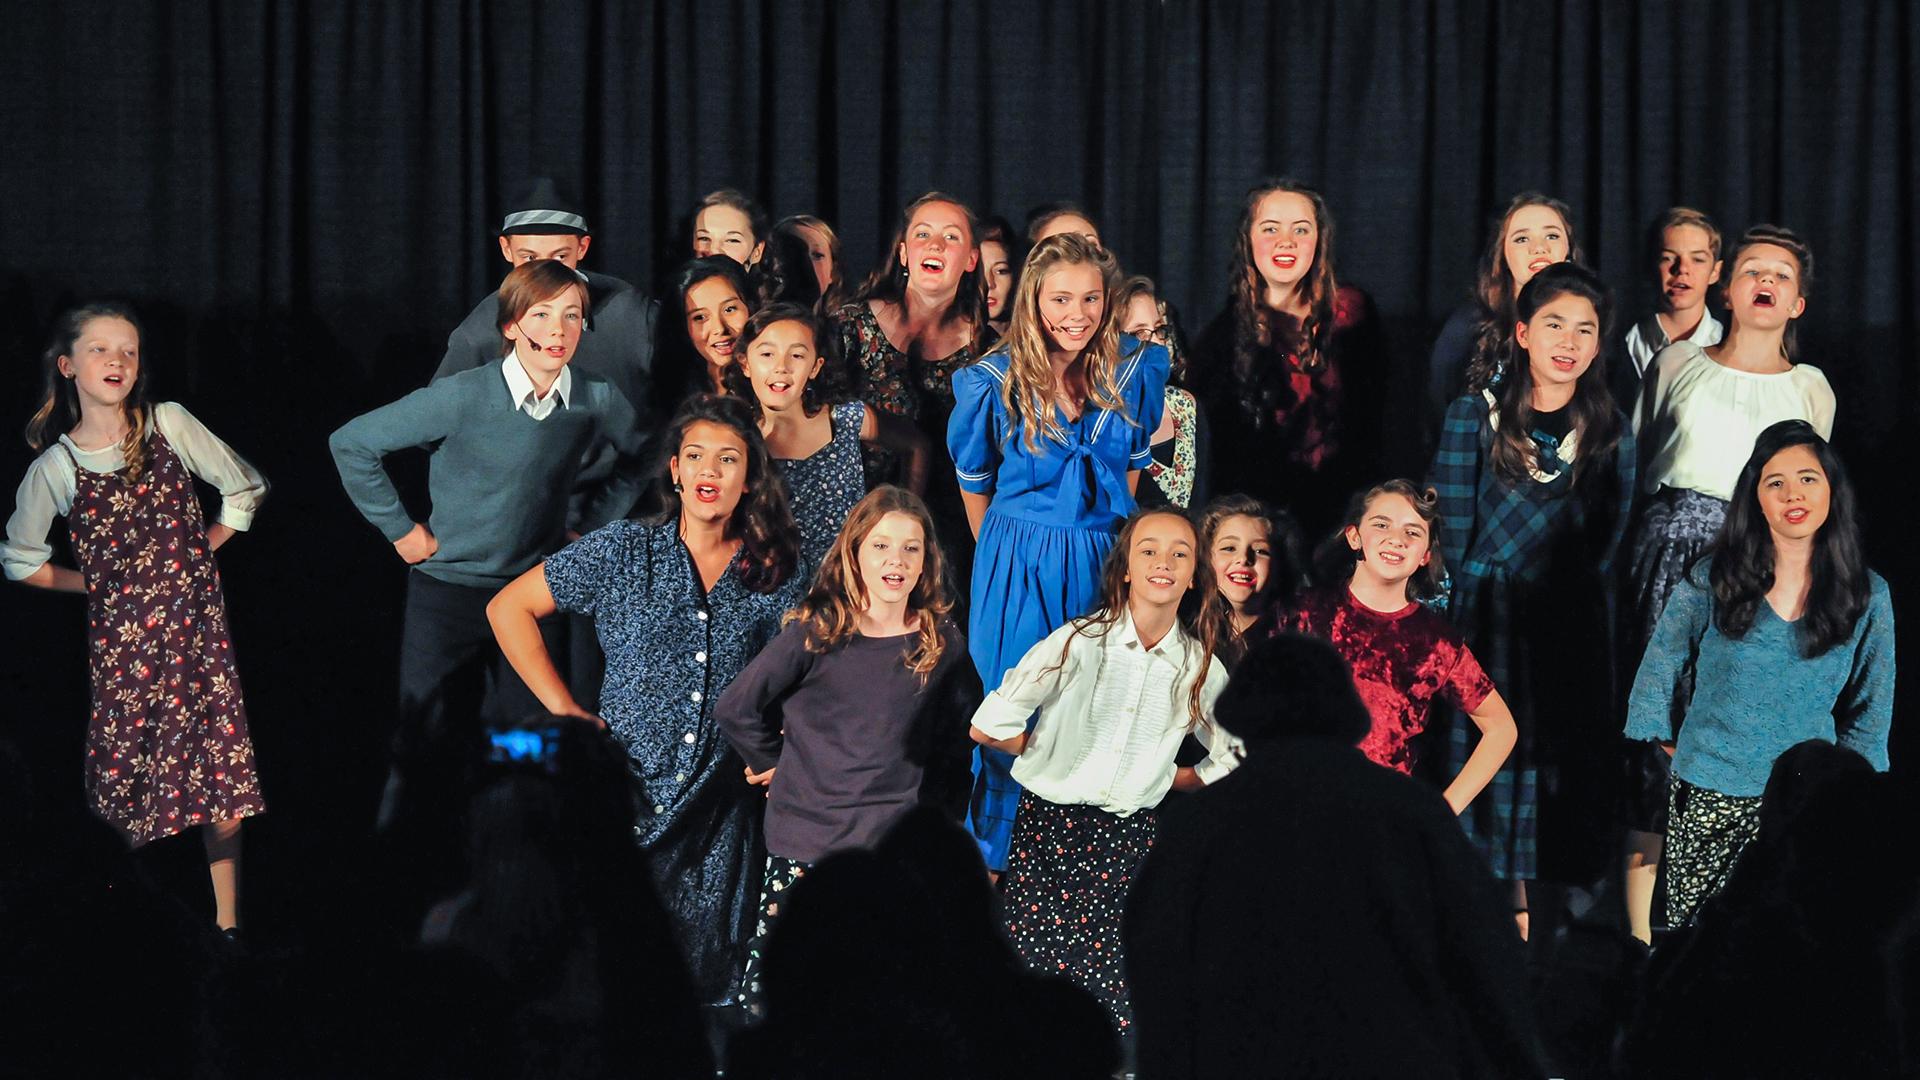 Team Broadway show